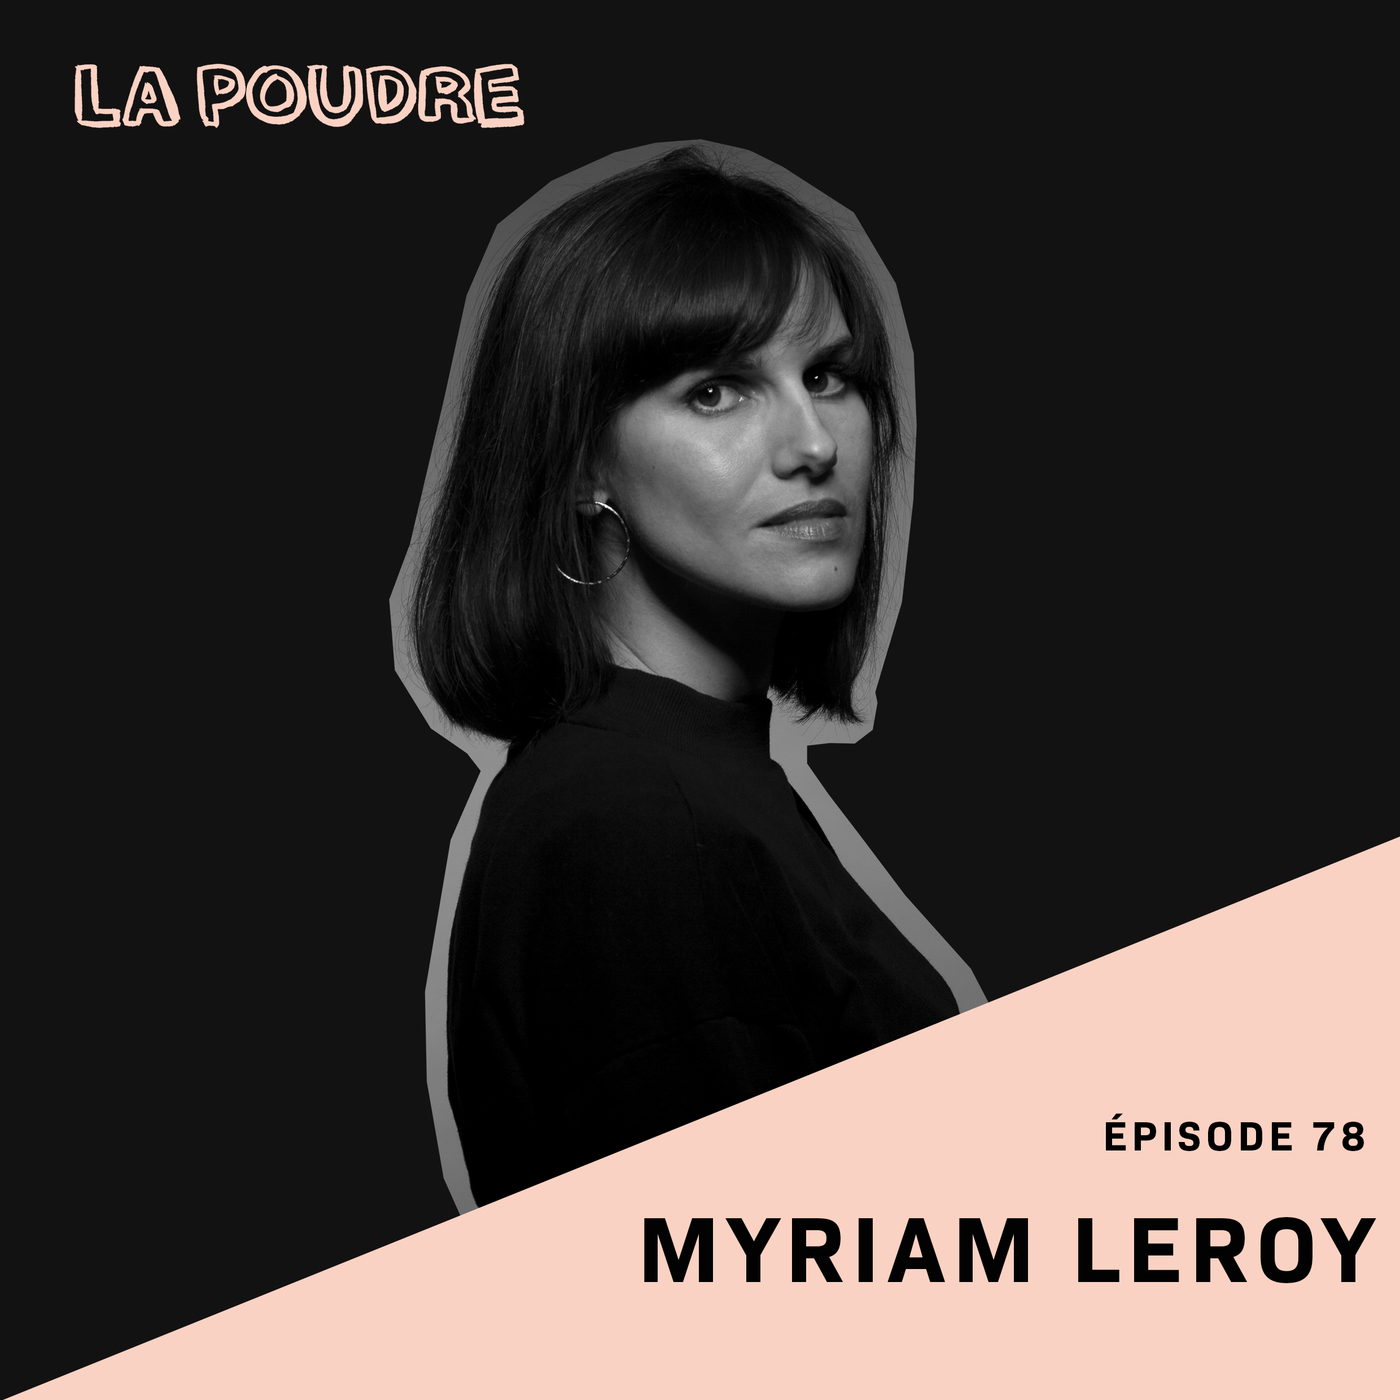 Épisode 78 - Myriam Leroy